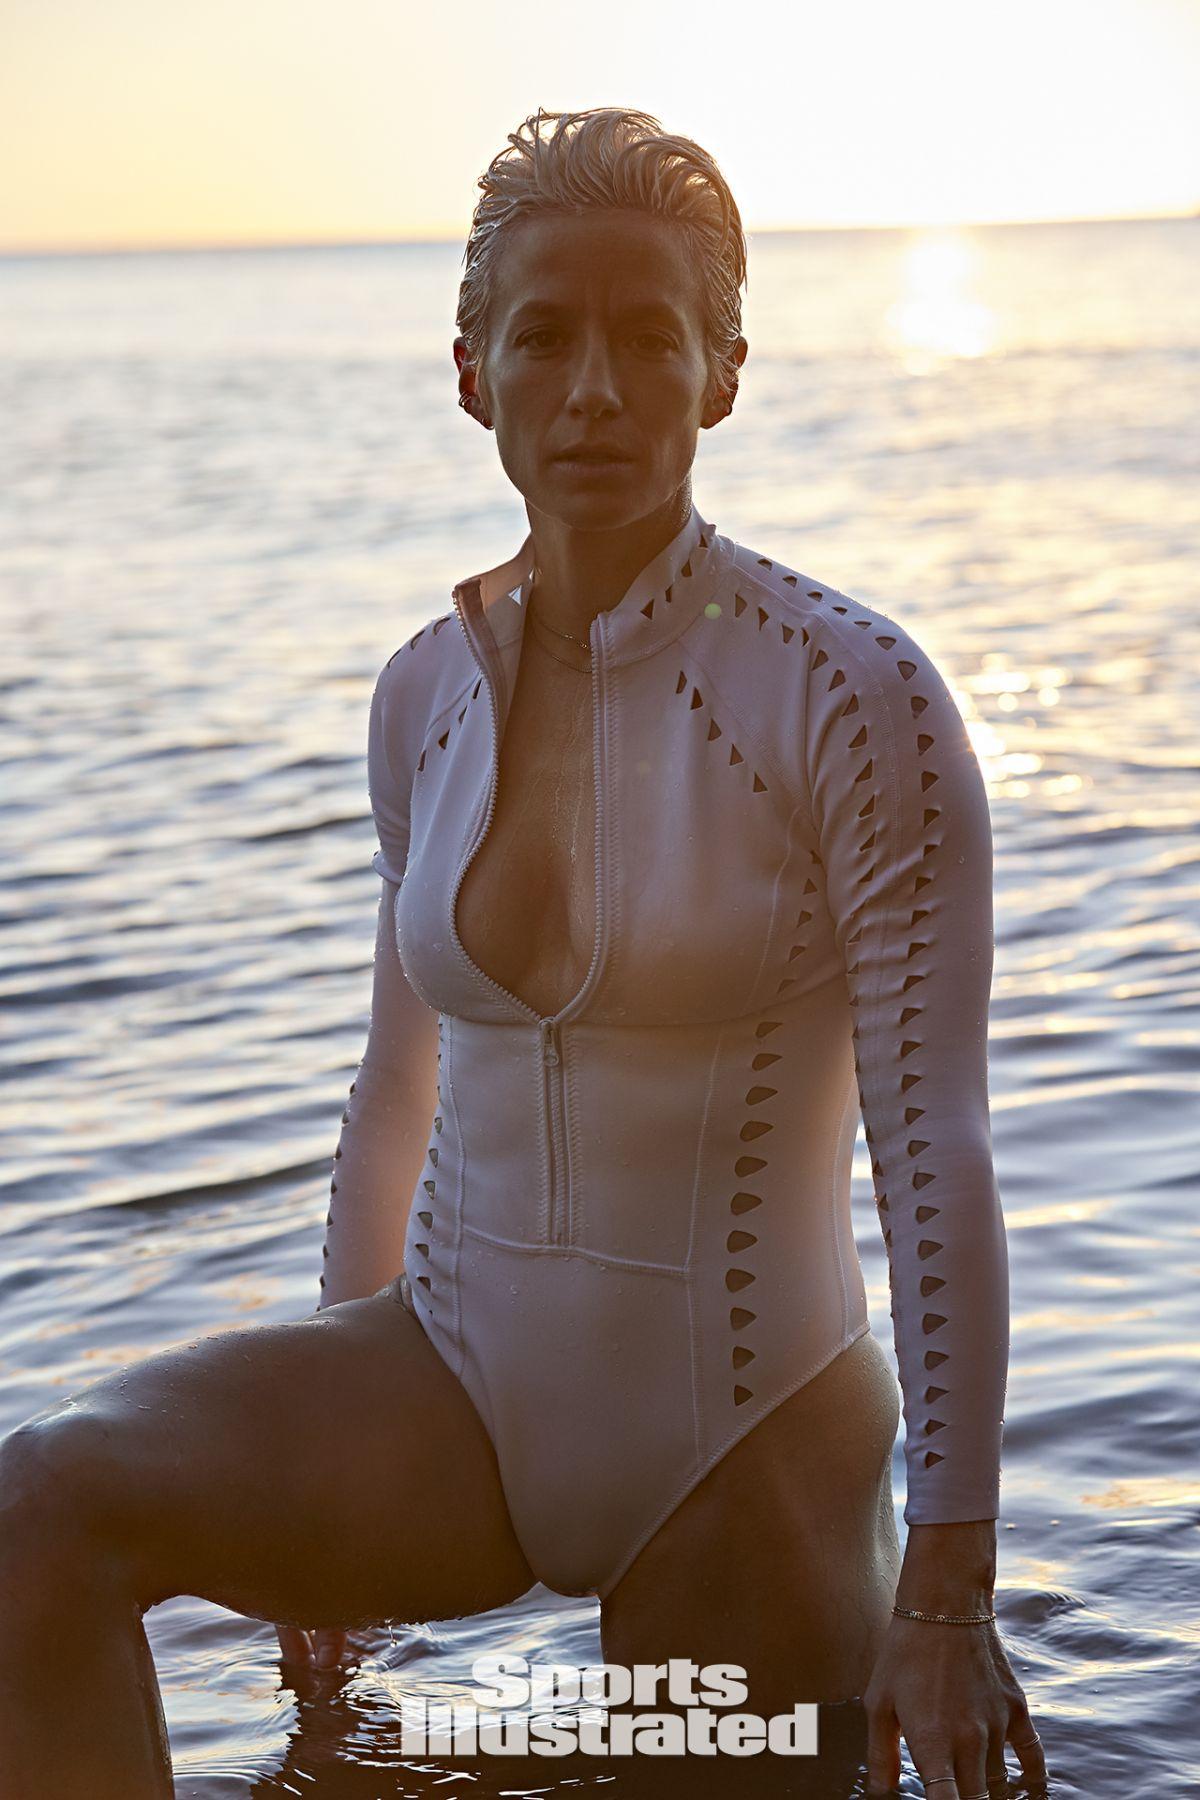 MEGAN RAPINOE in Sports Illustrated Swimsuit 2019 Issue